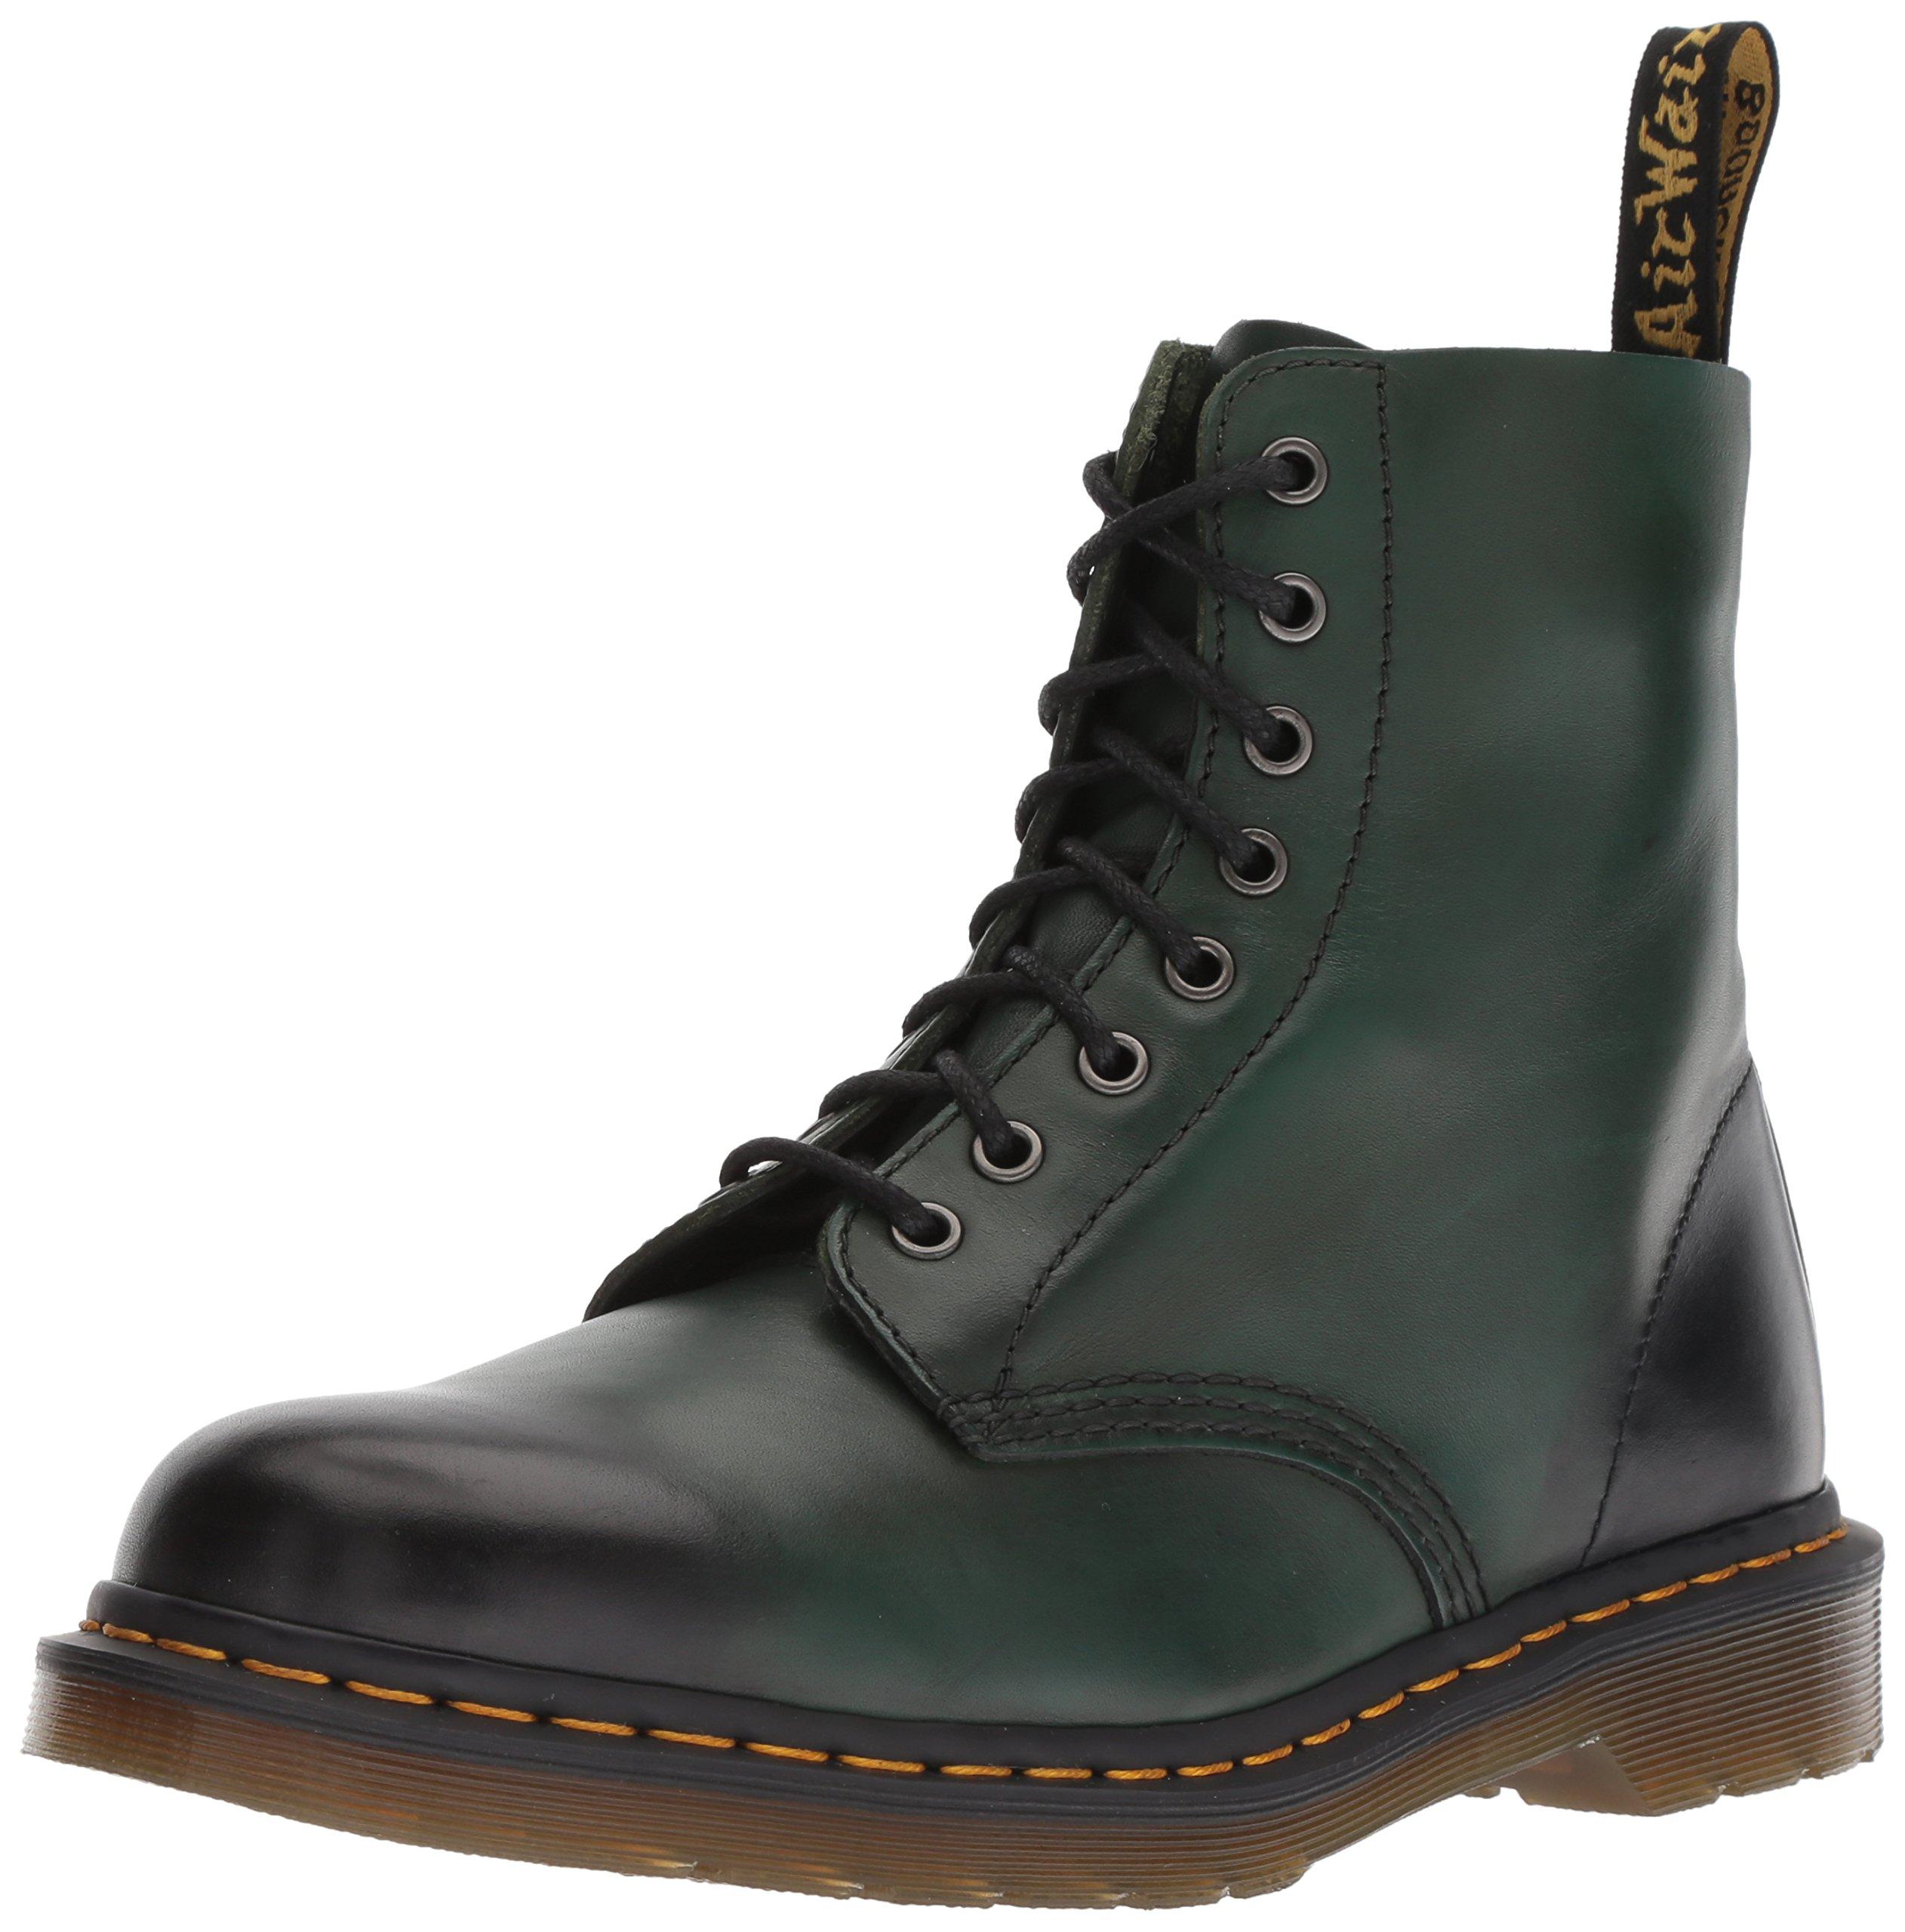 Dr. Martens 1460 Pascal Mid Calf Boot, Green, 3 M